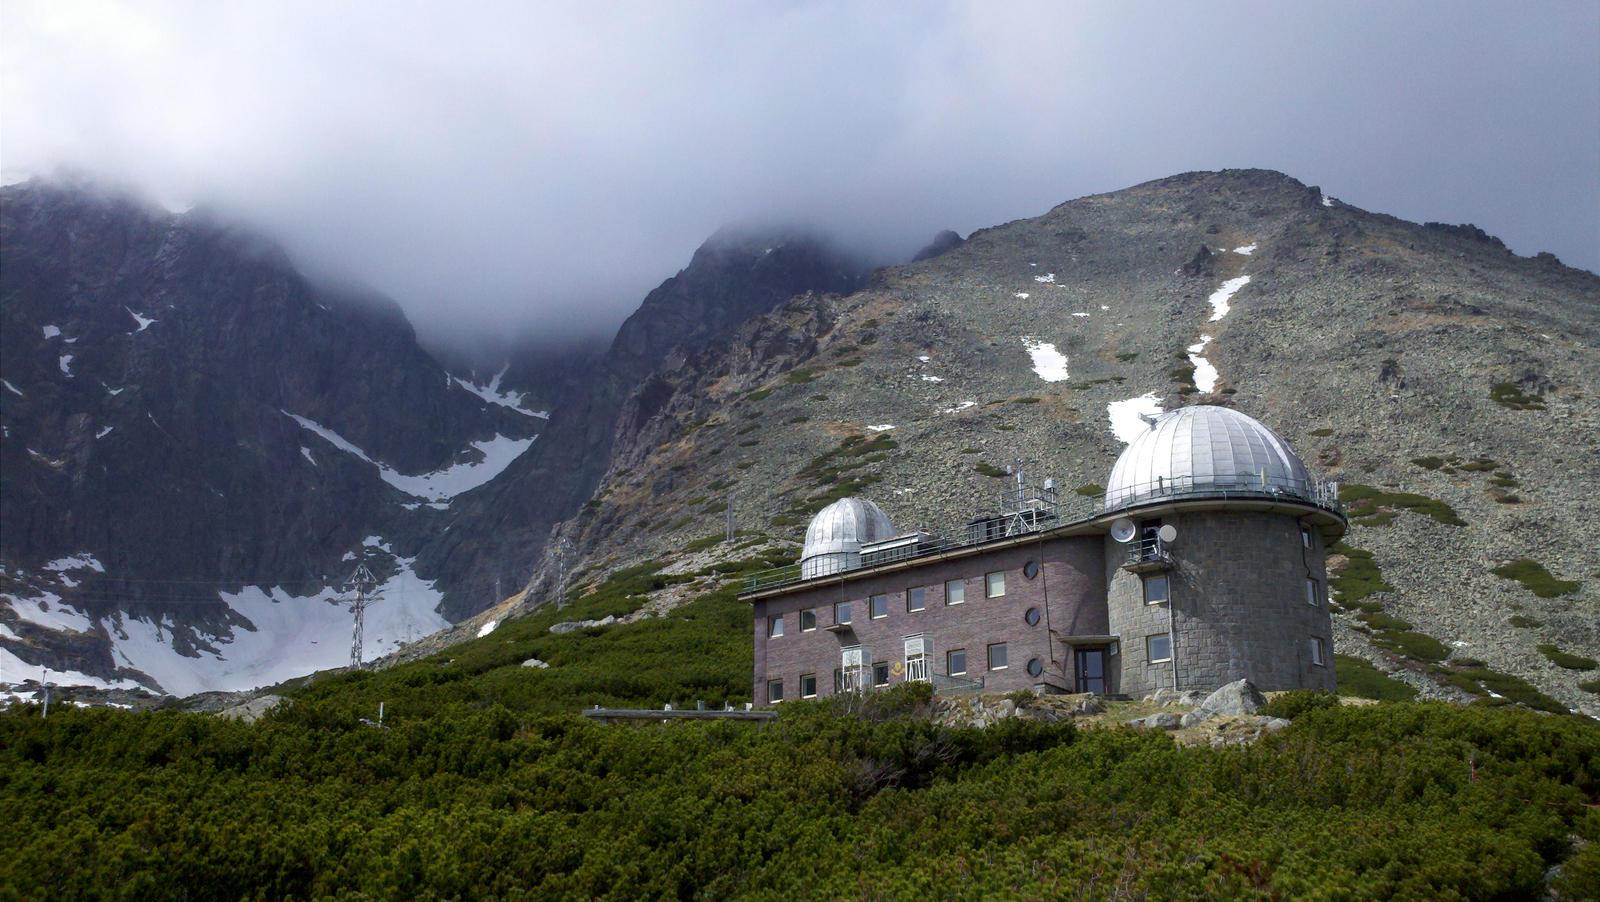 Skalnate pleso High Tatras by TakyJedenChalan on DeviantArt